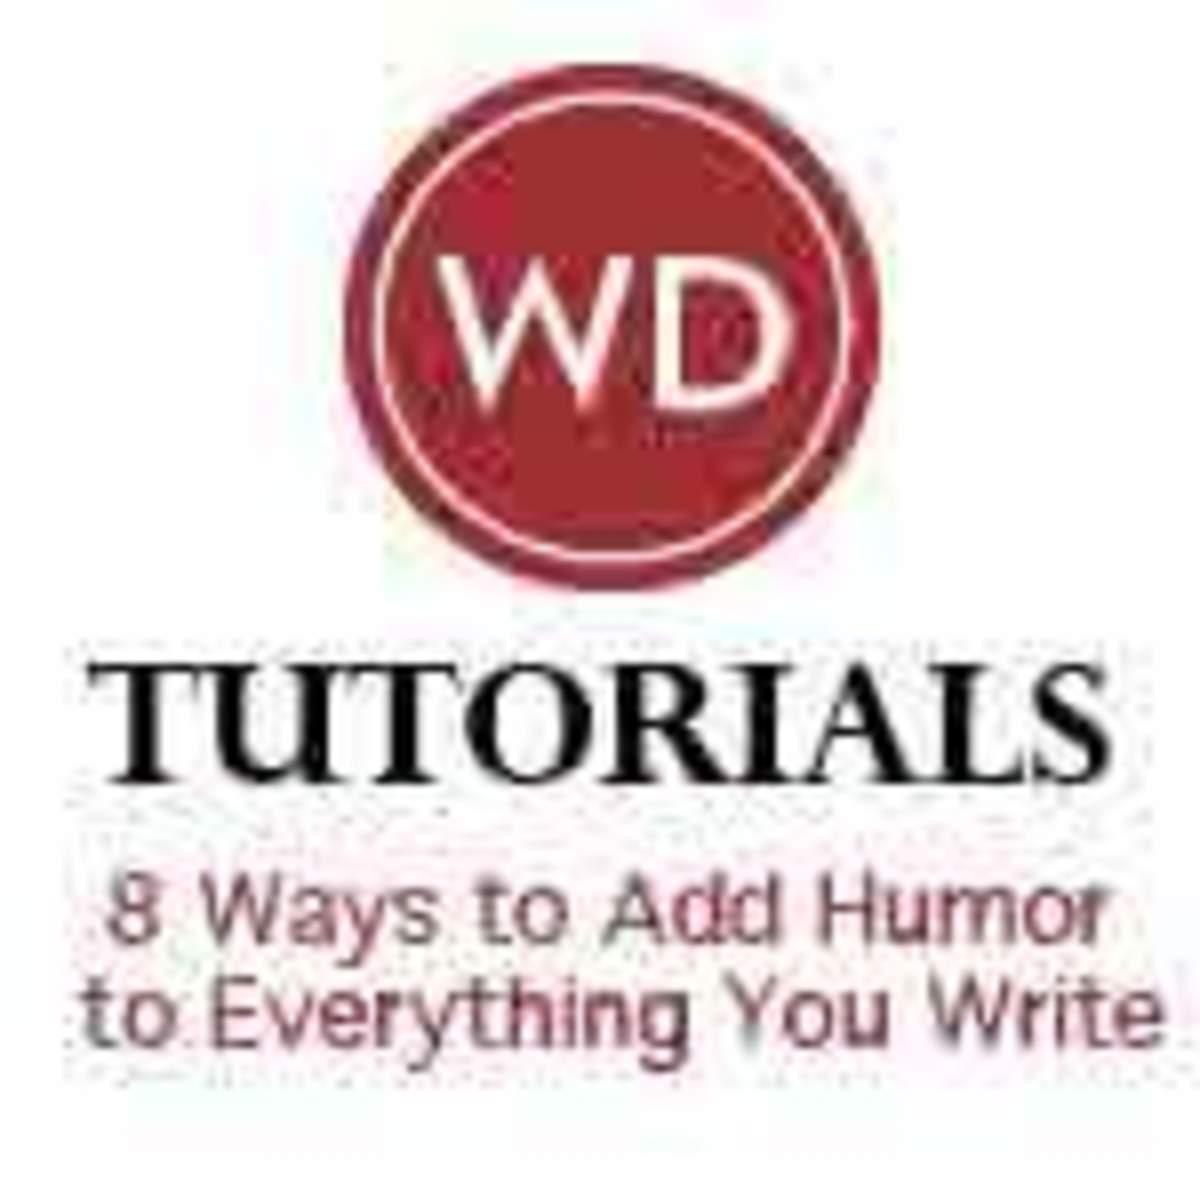 8_Ways_to_Add_Humor_180x